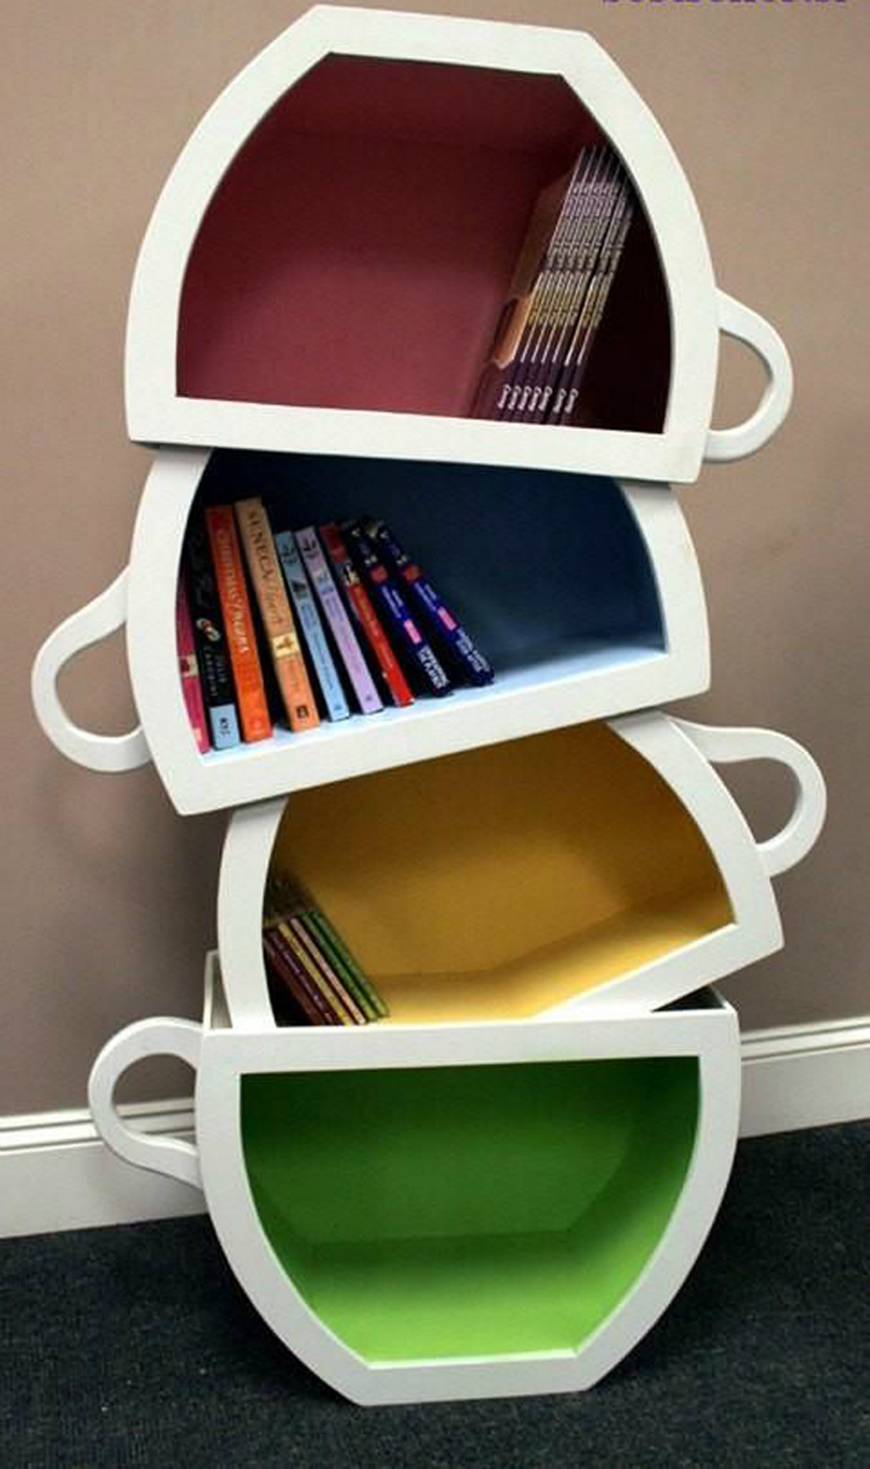 fun bookcase ideas Fun Bookcase Ideas To Stylish Your Kids Rooms Fun Bookcase Ideas To Stylish Your Kids Rooms 5